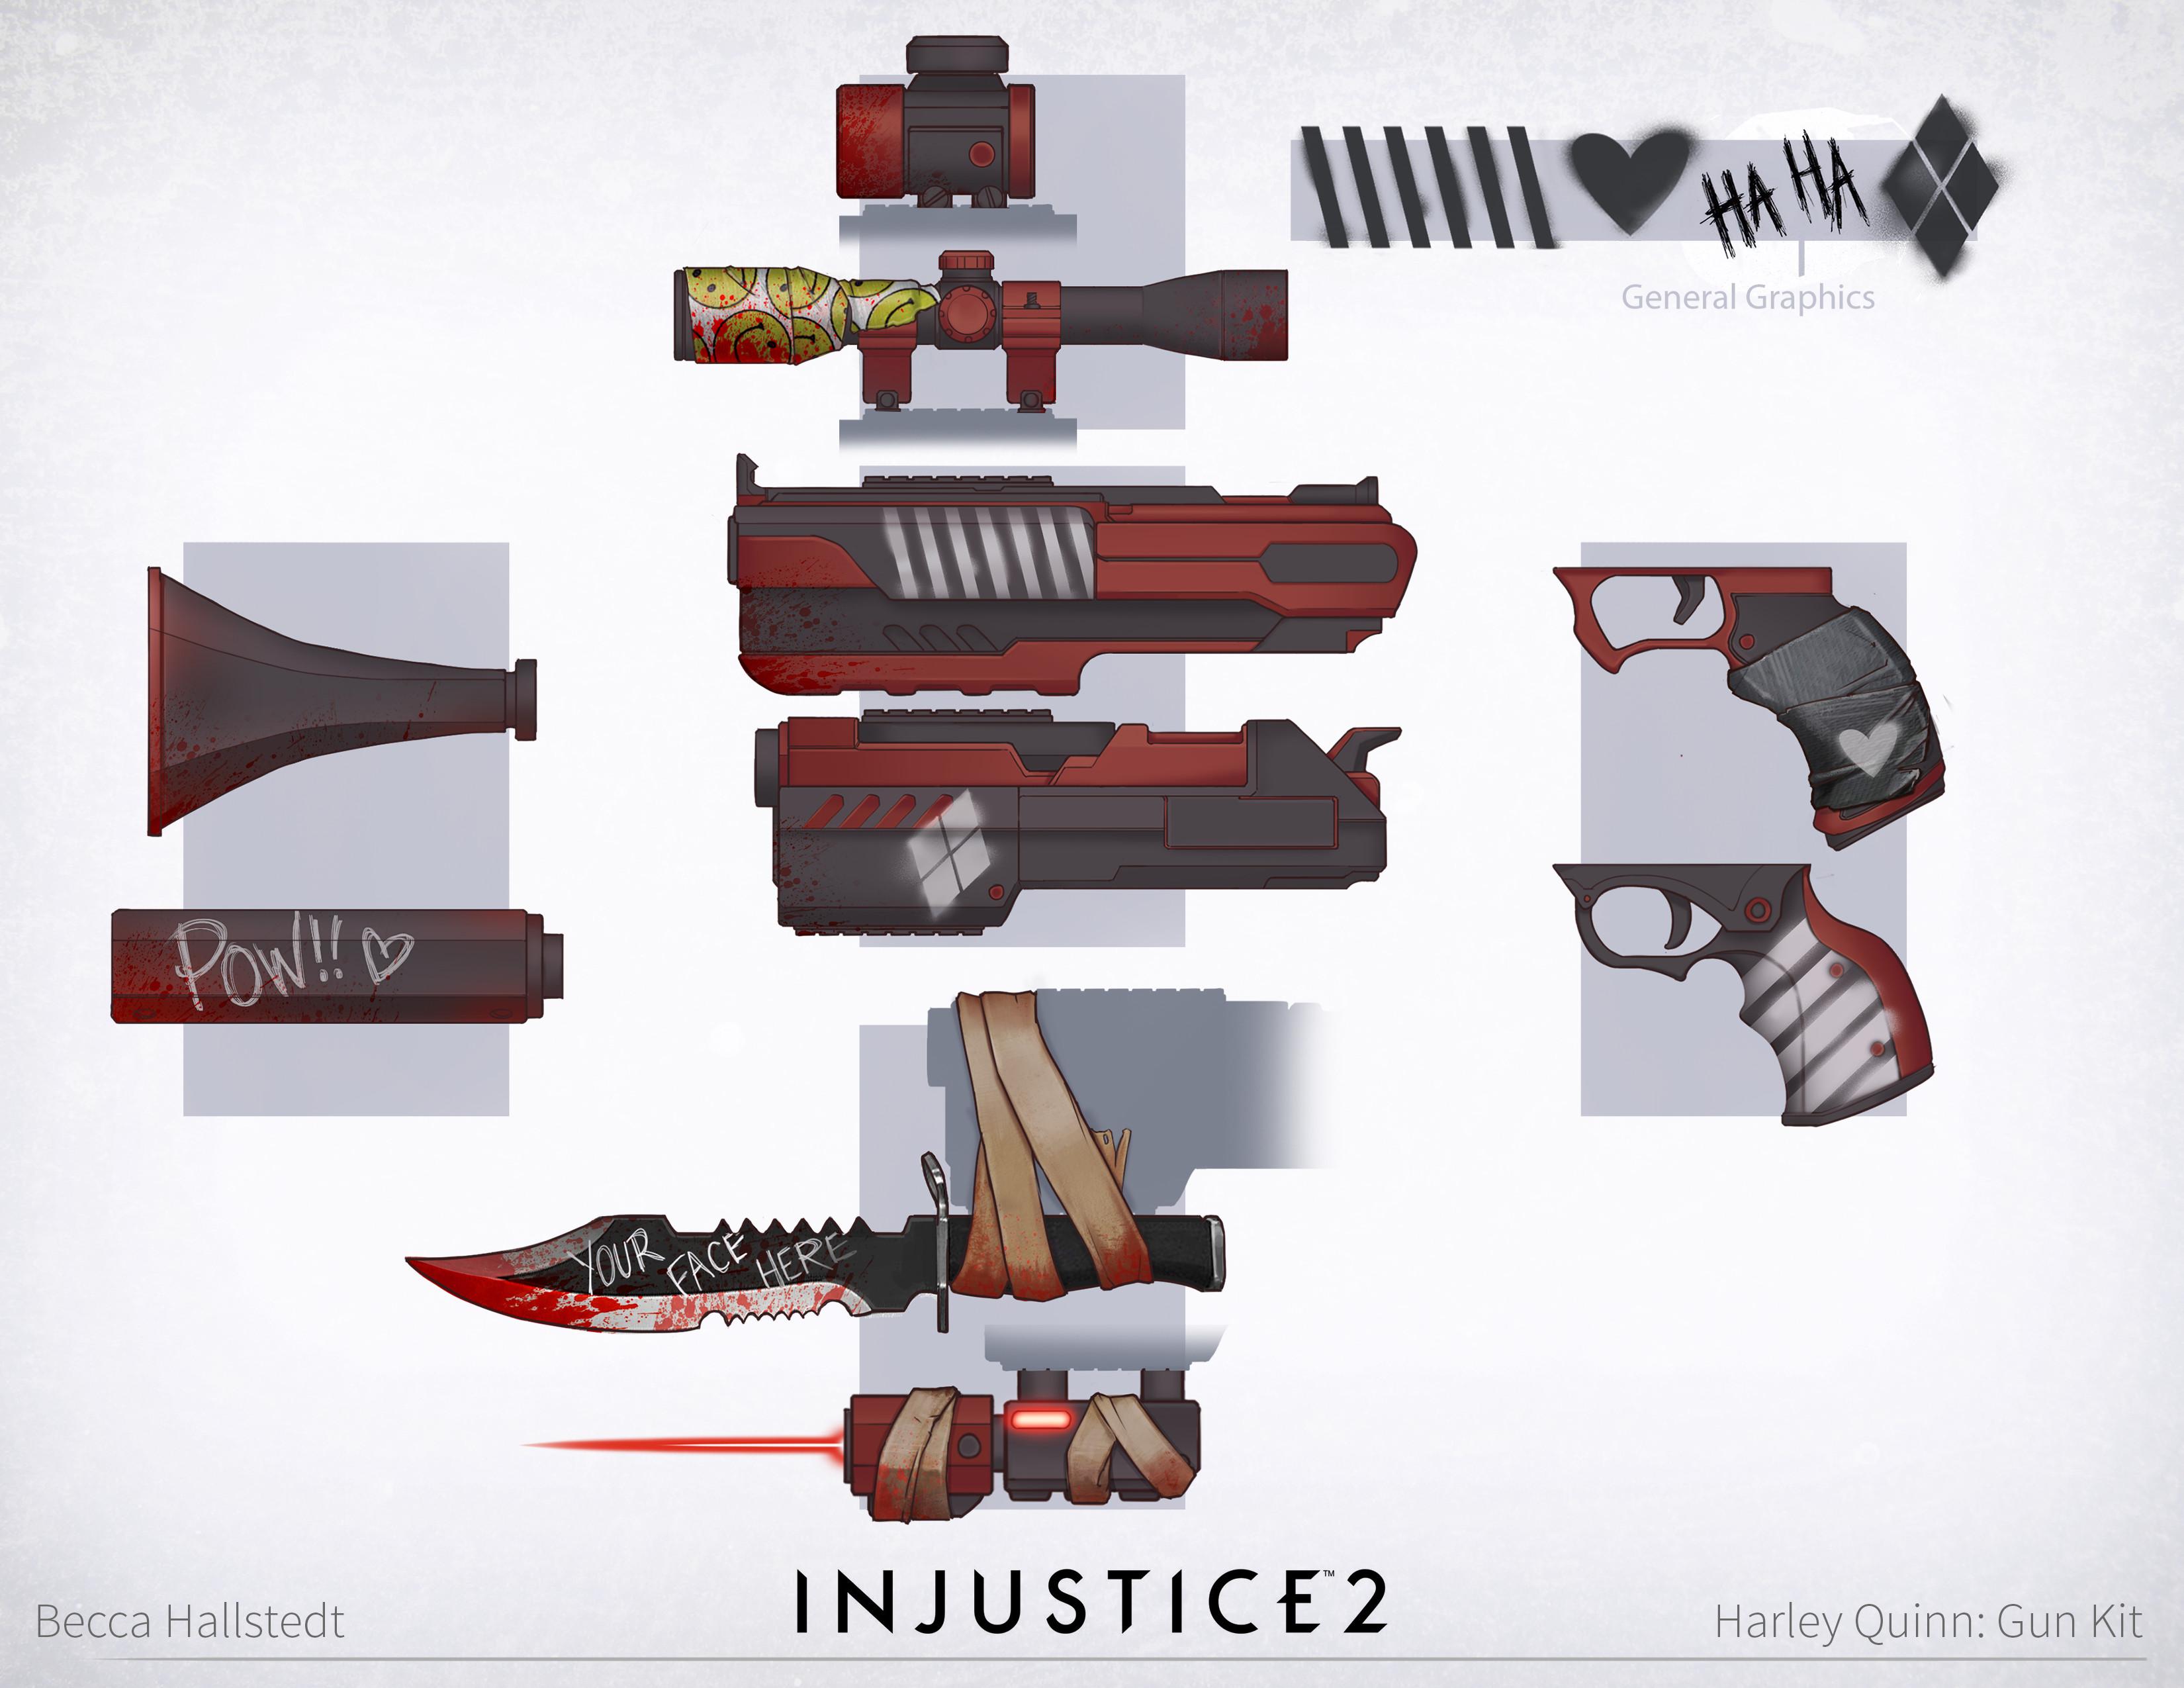 Moar gun kits!